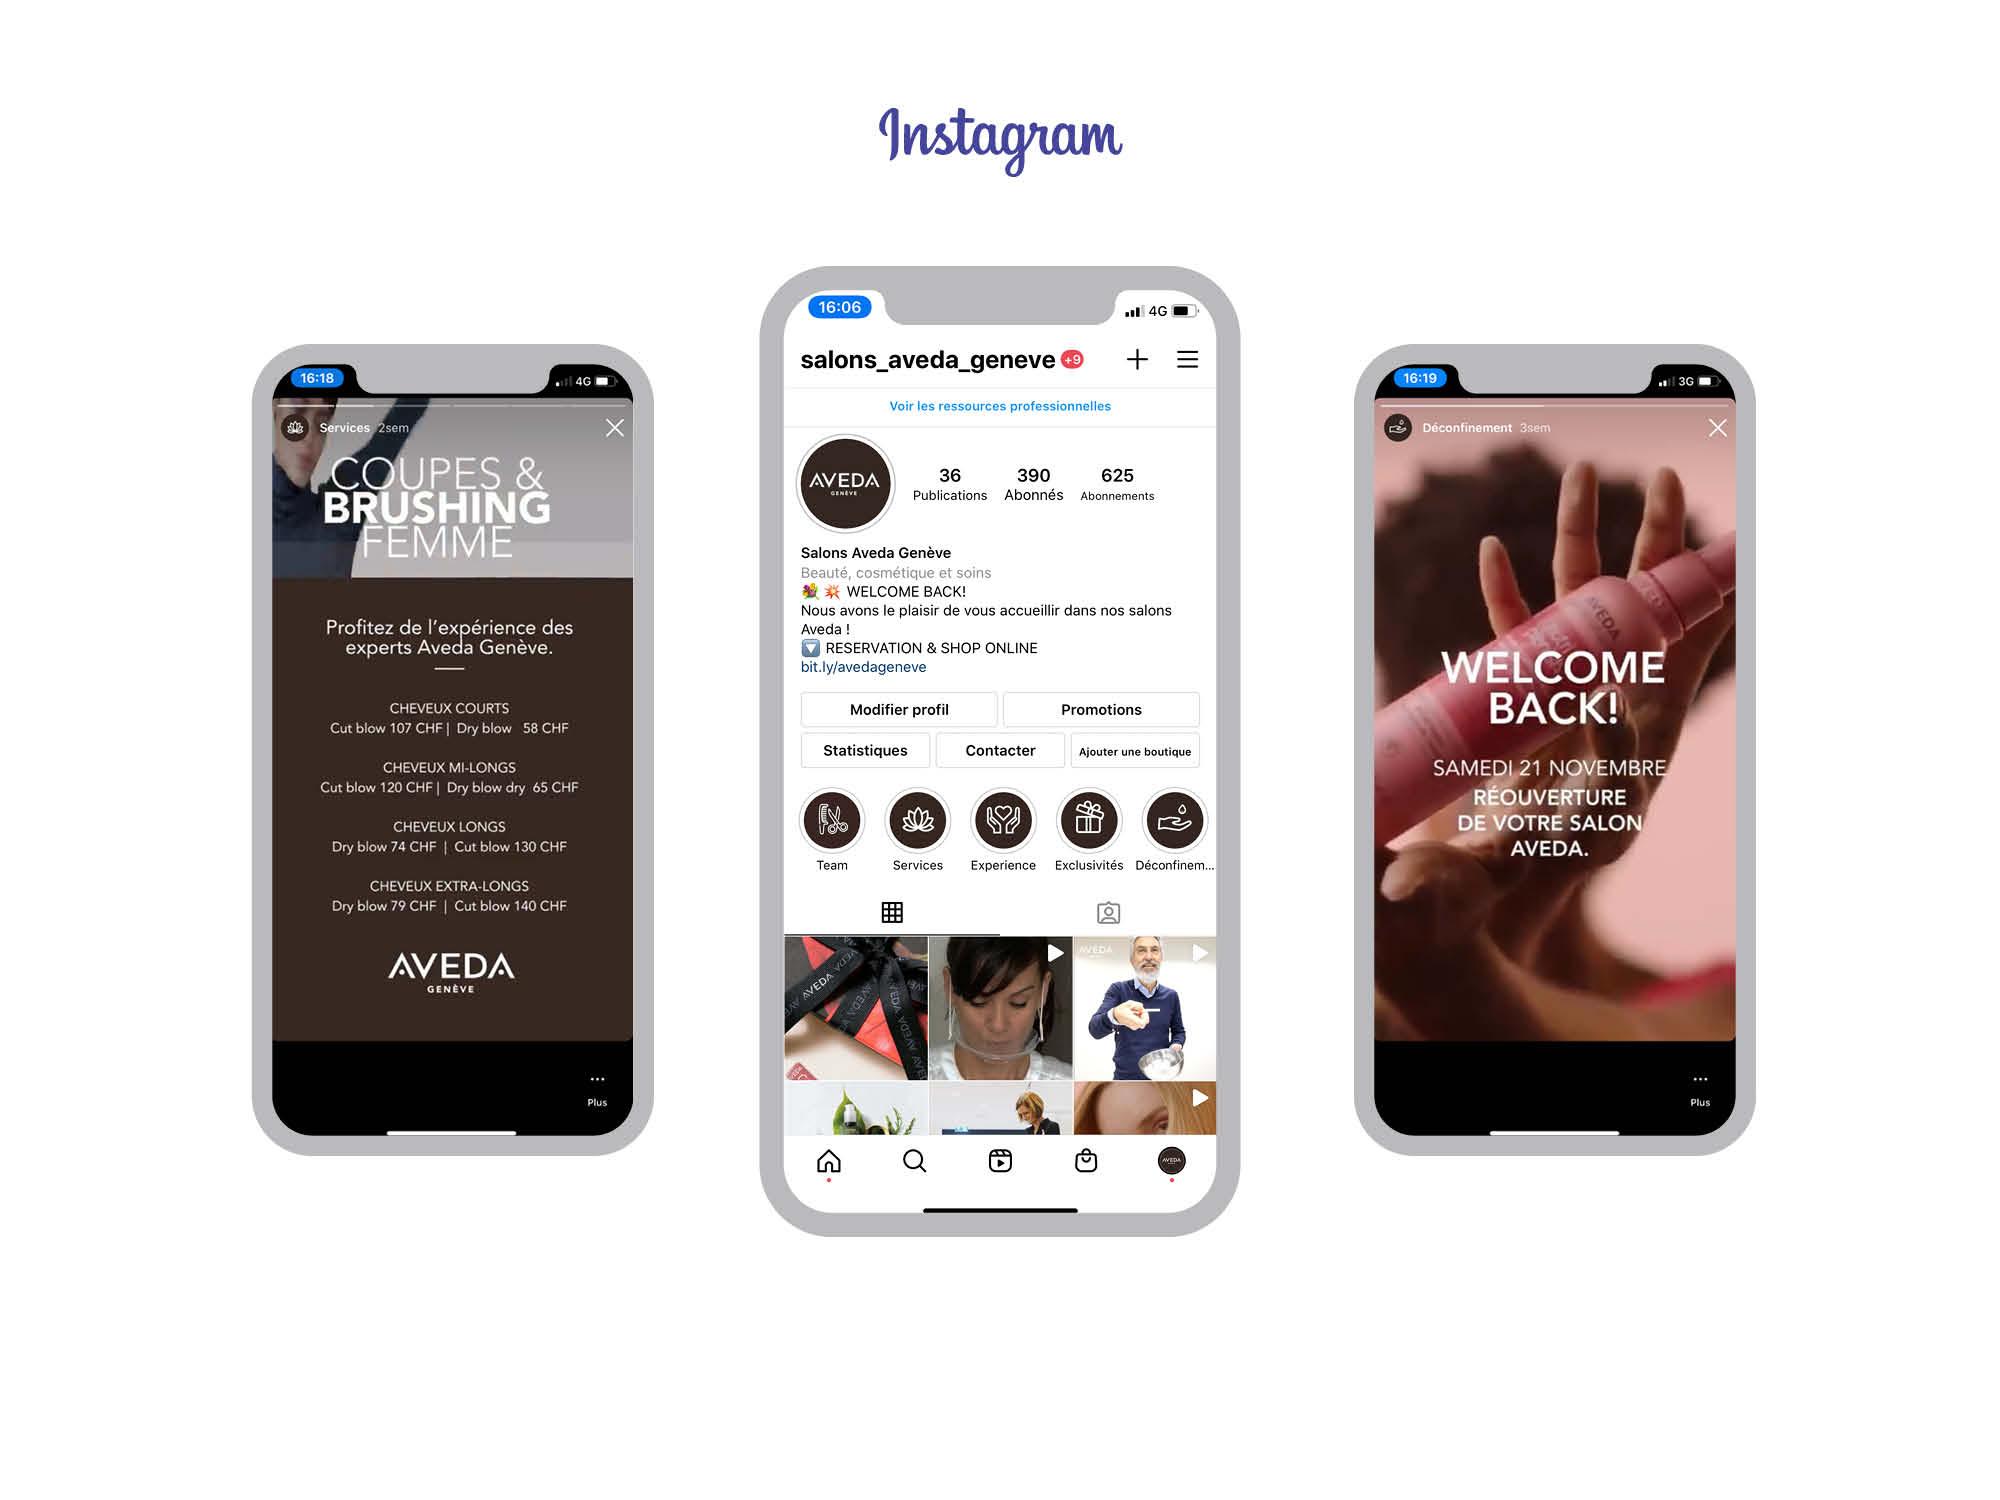 Social Media Aveda Instagram